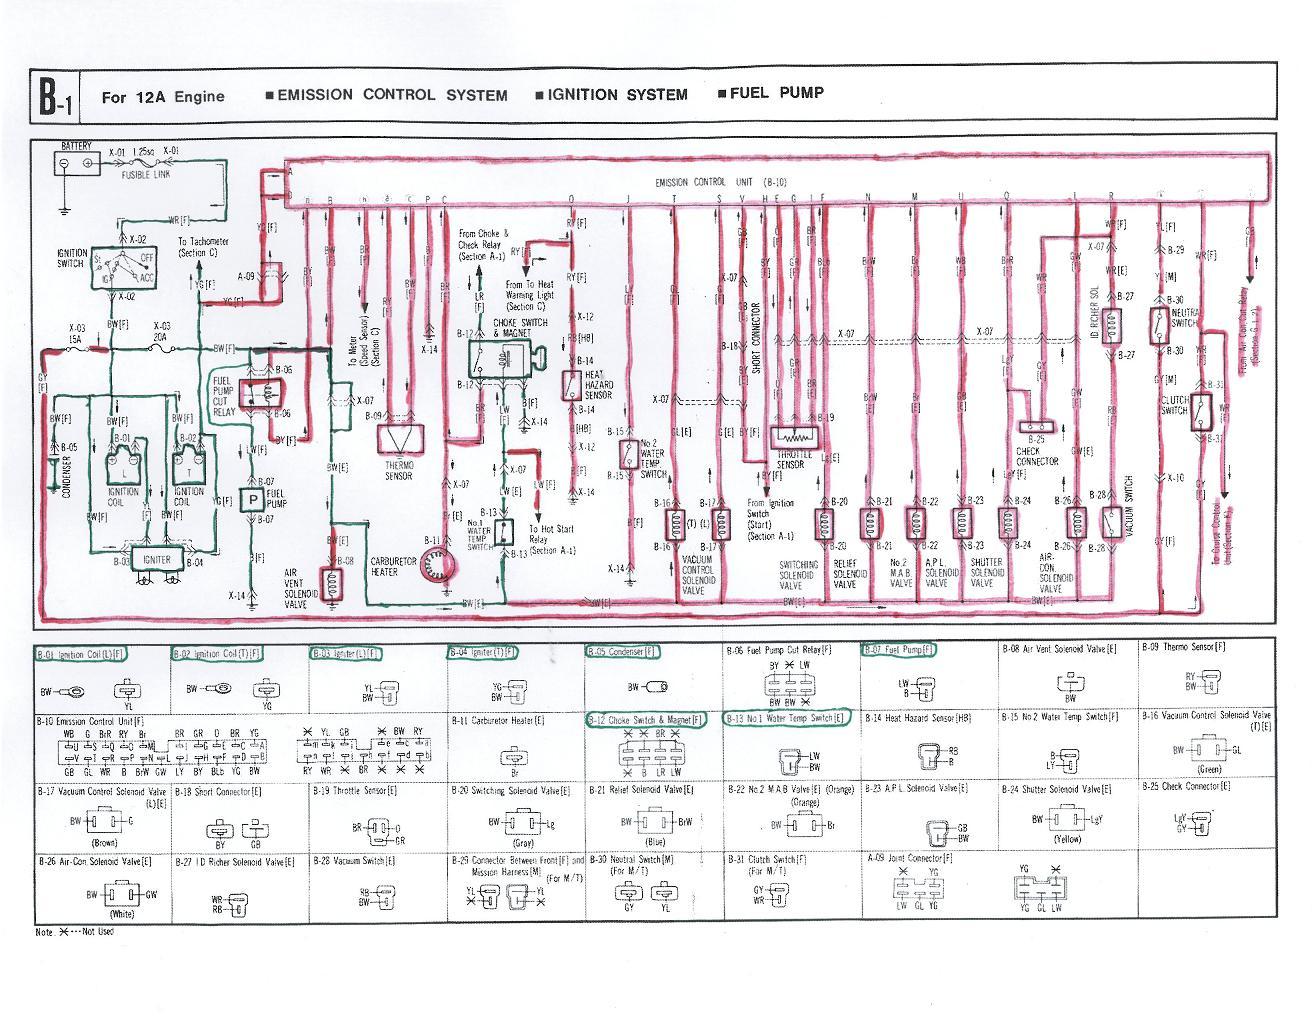 2000 sterling truck wiring diagram: 2006 sterling fuse box diagram - wiring  diagramrh:cleanprosperity